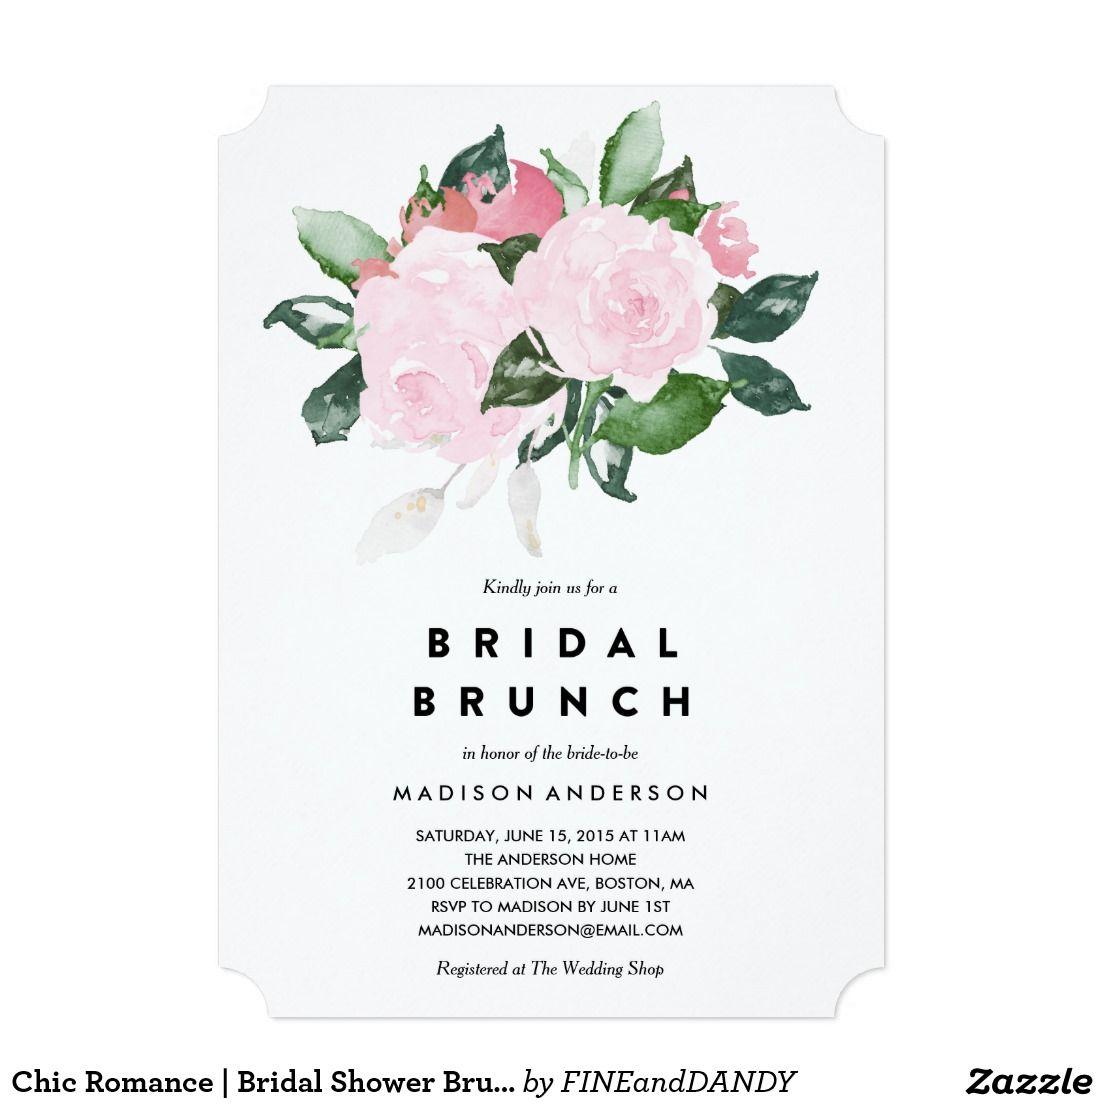 Chic Romance Bridal Shower Brunch Invitation Brunch Invitations